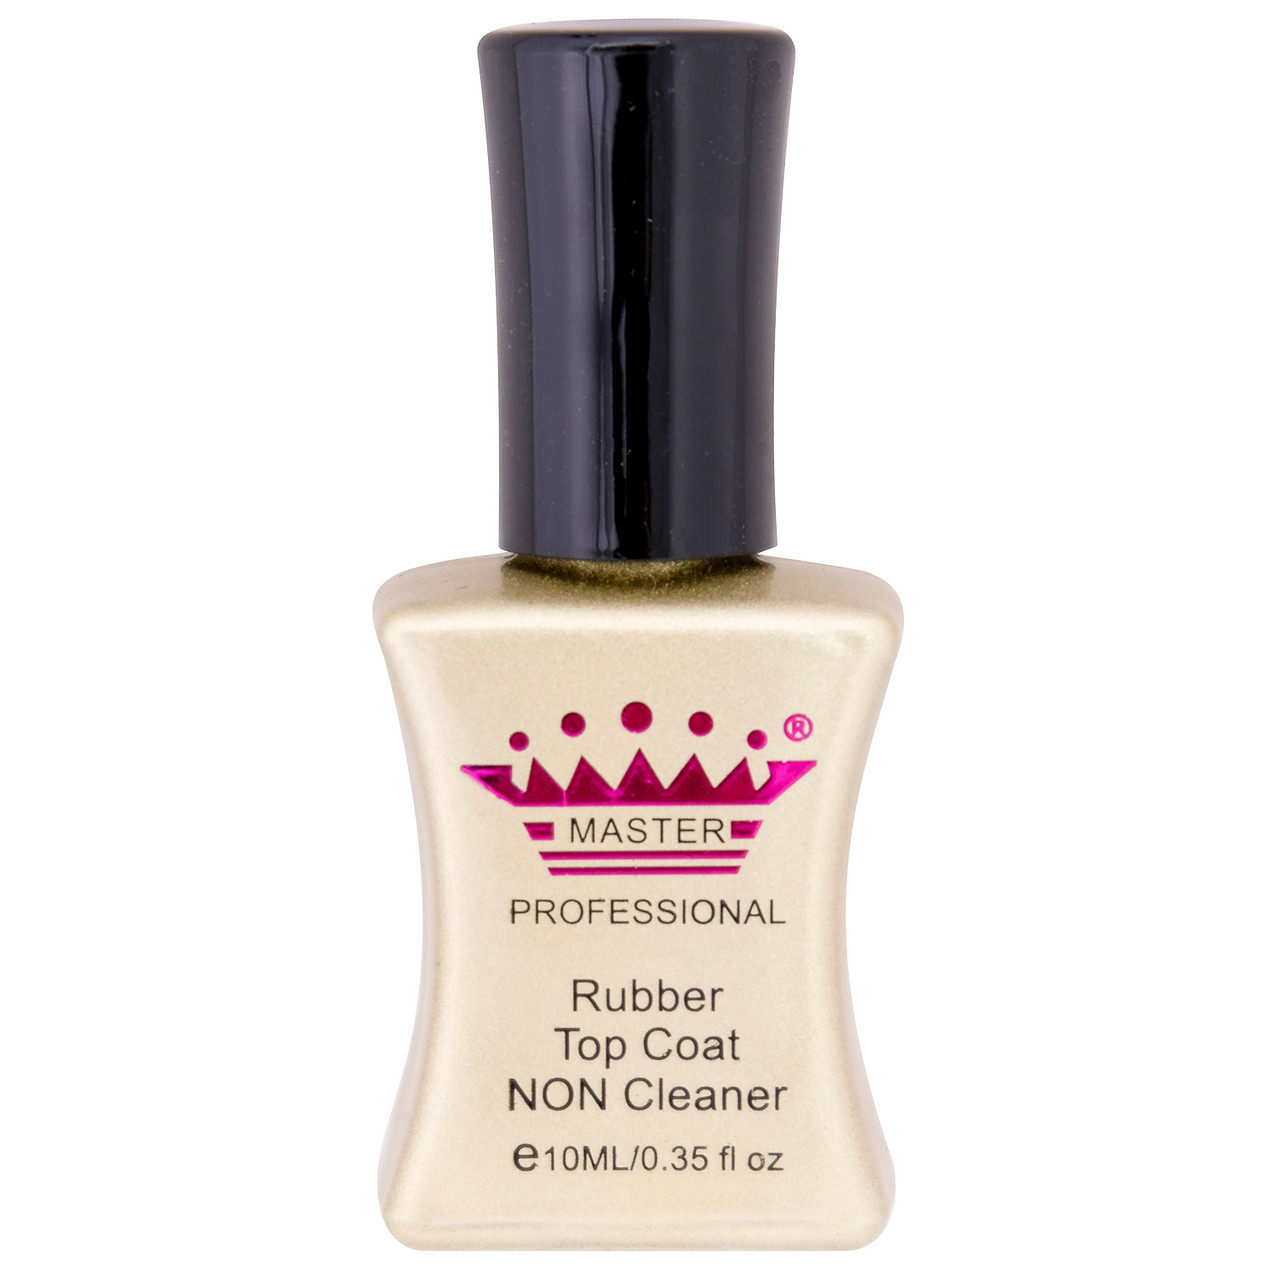 Rubber top non cleaner 10 мл master professional(верхнее покрытие без липкого слоя)